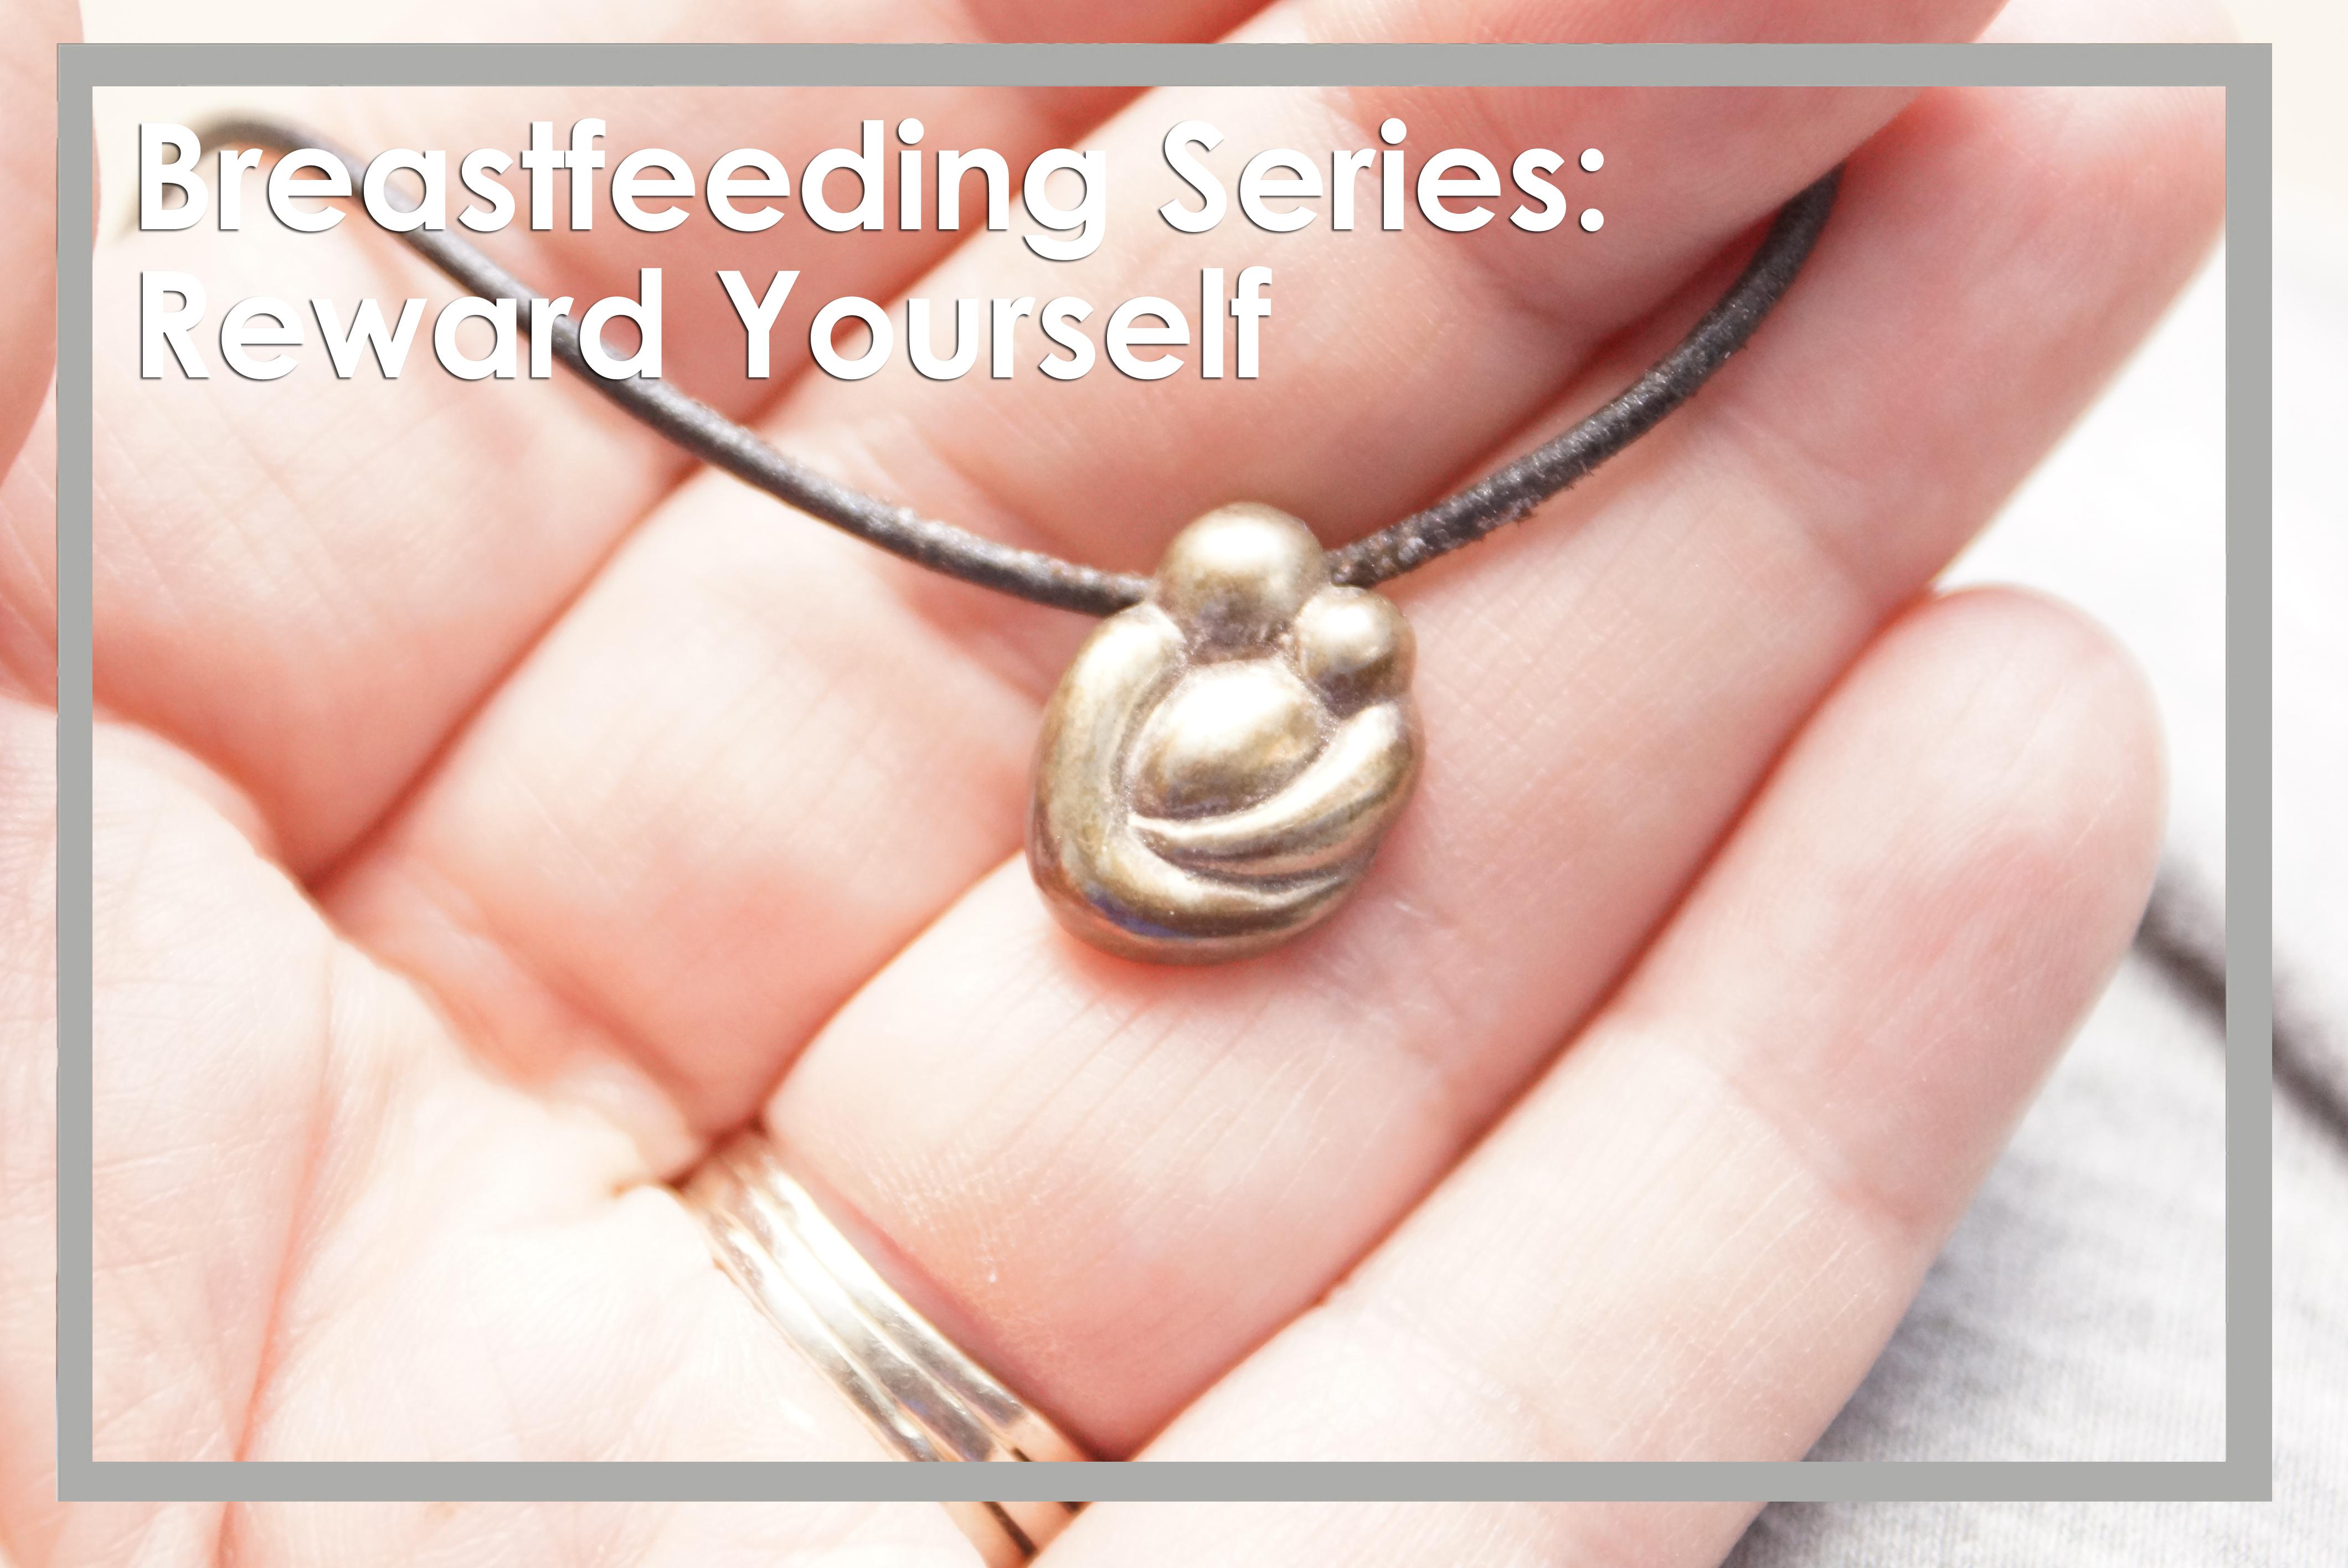 Breastfeeding Series: Final Thought – Reward Yourself for Breastfeeding